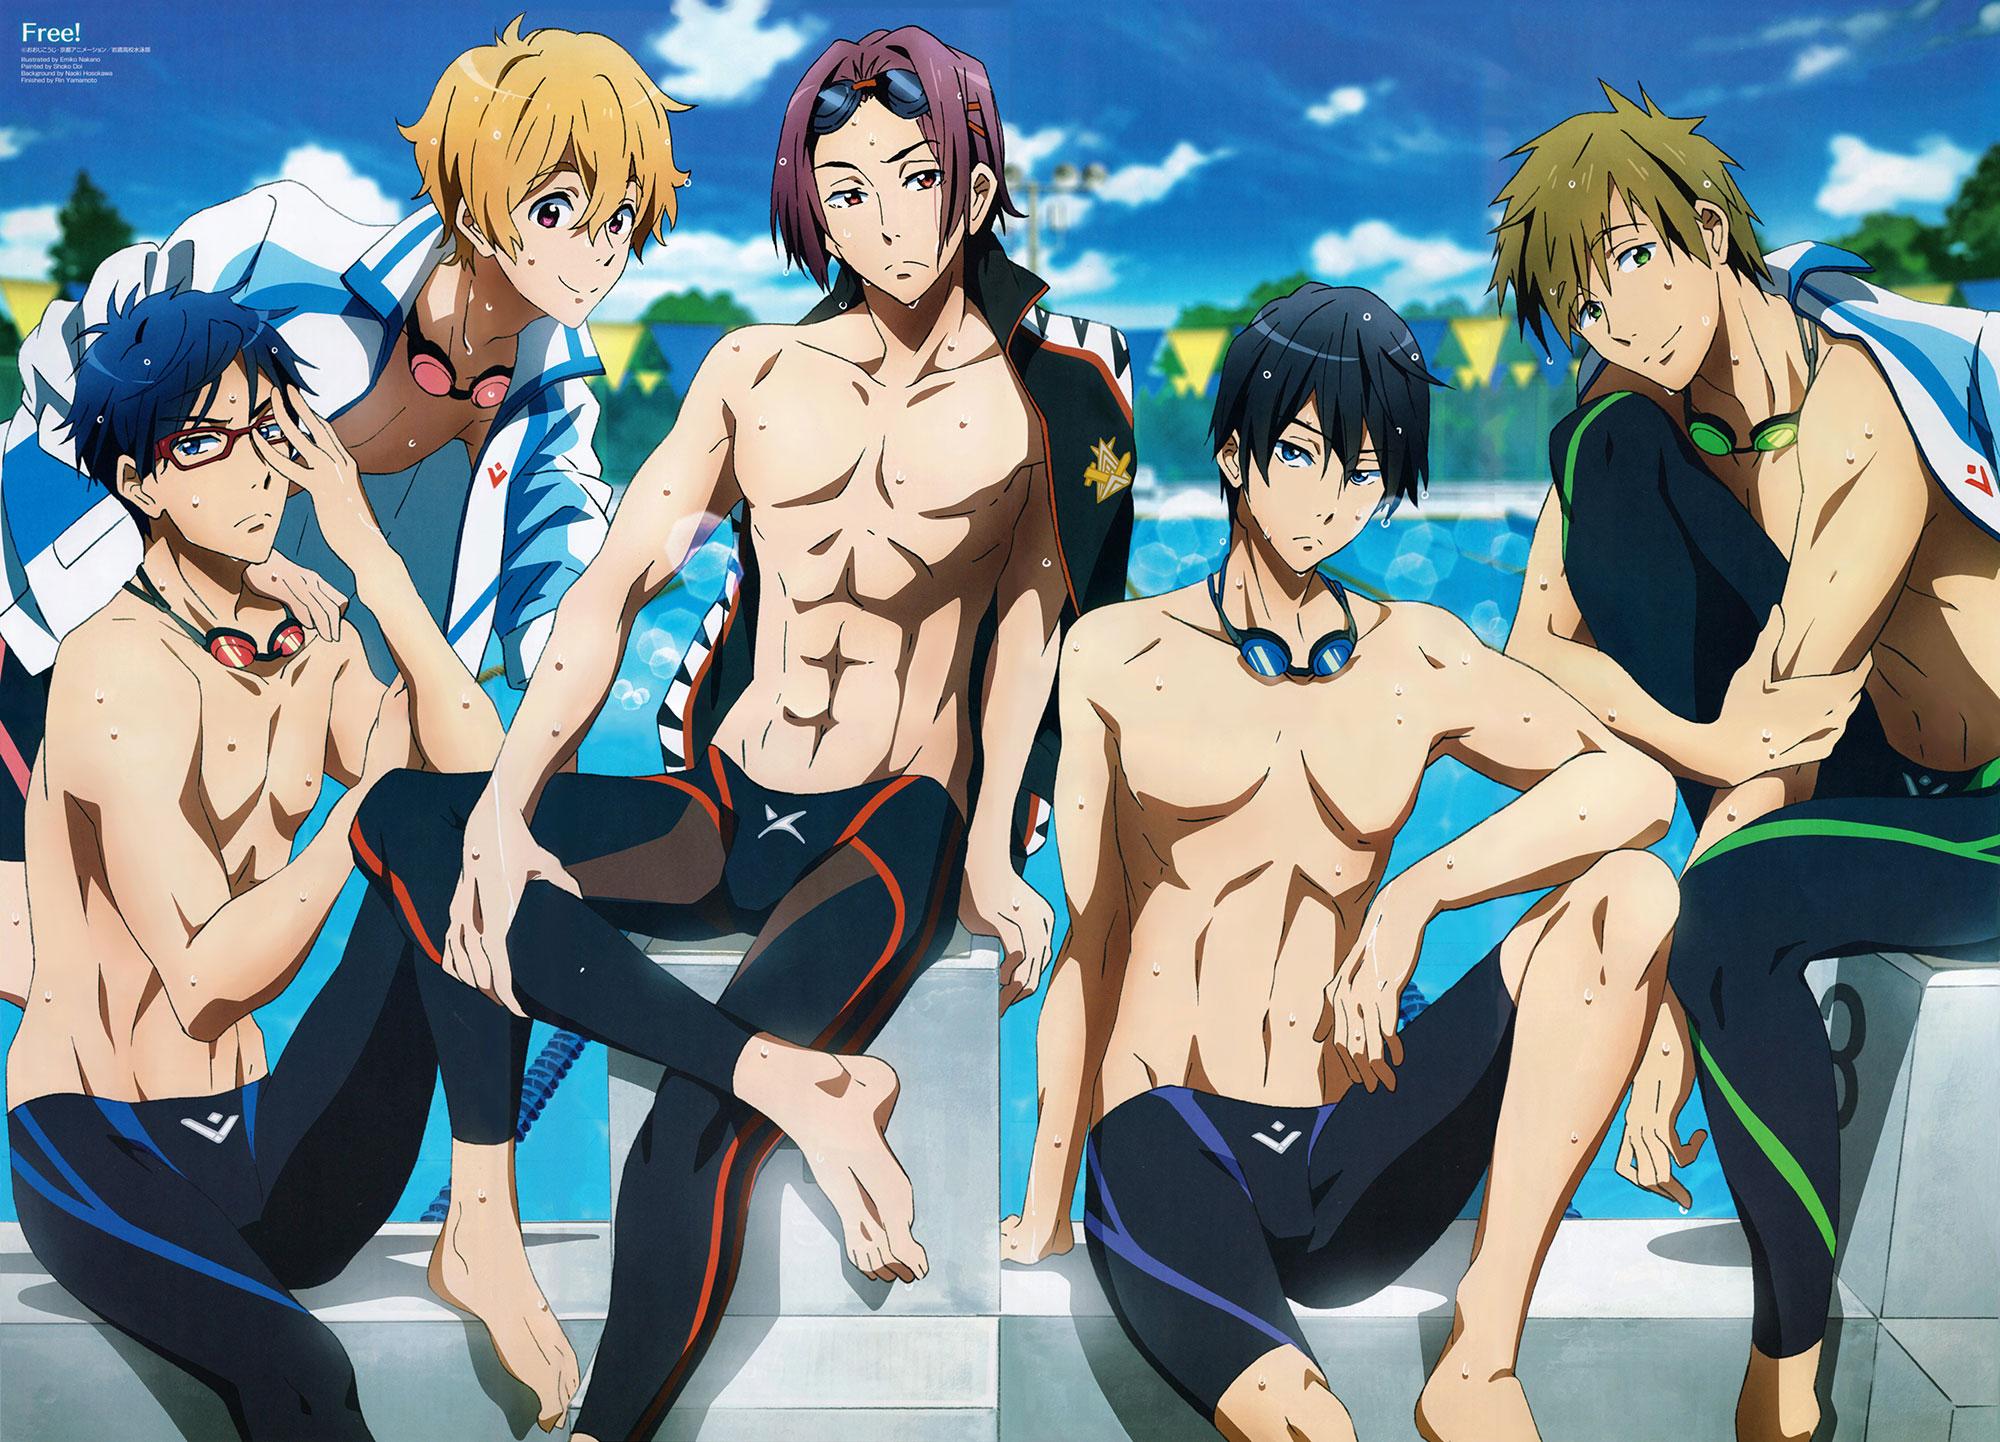 Free sexy anime pic